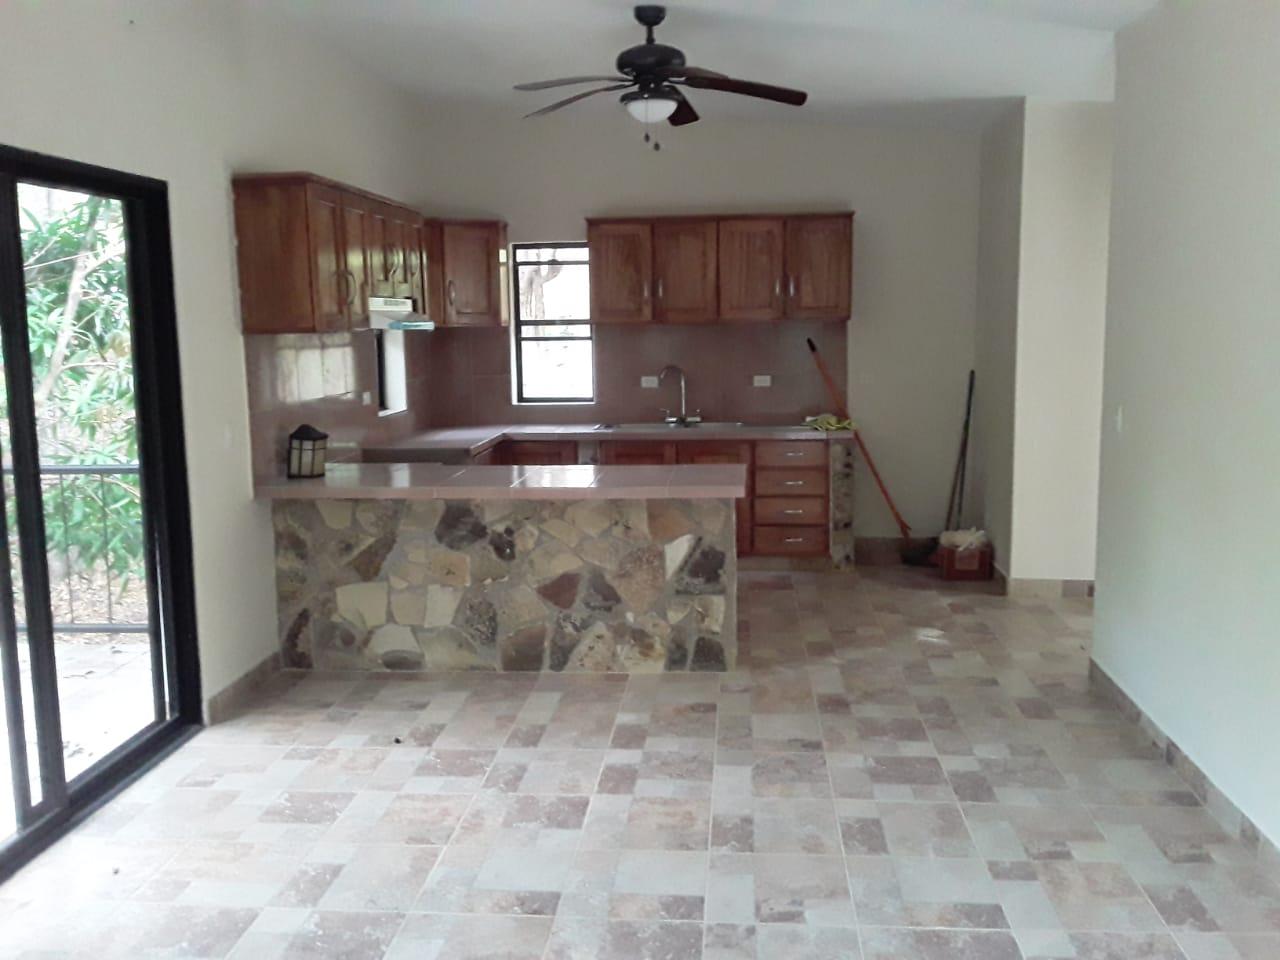 Sold Nicaragua Real Estate San Juan Del Sur 2 bedroom 2 bathroom